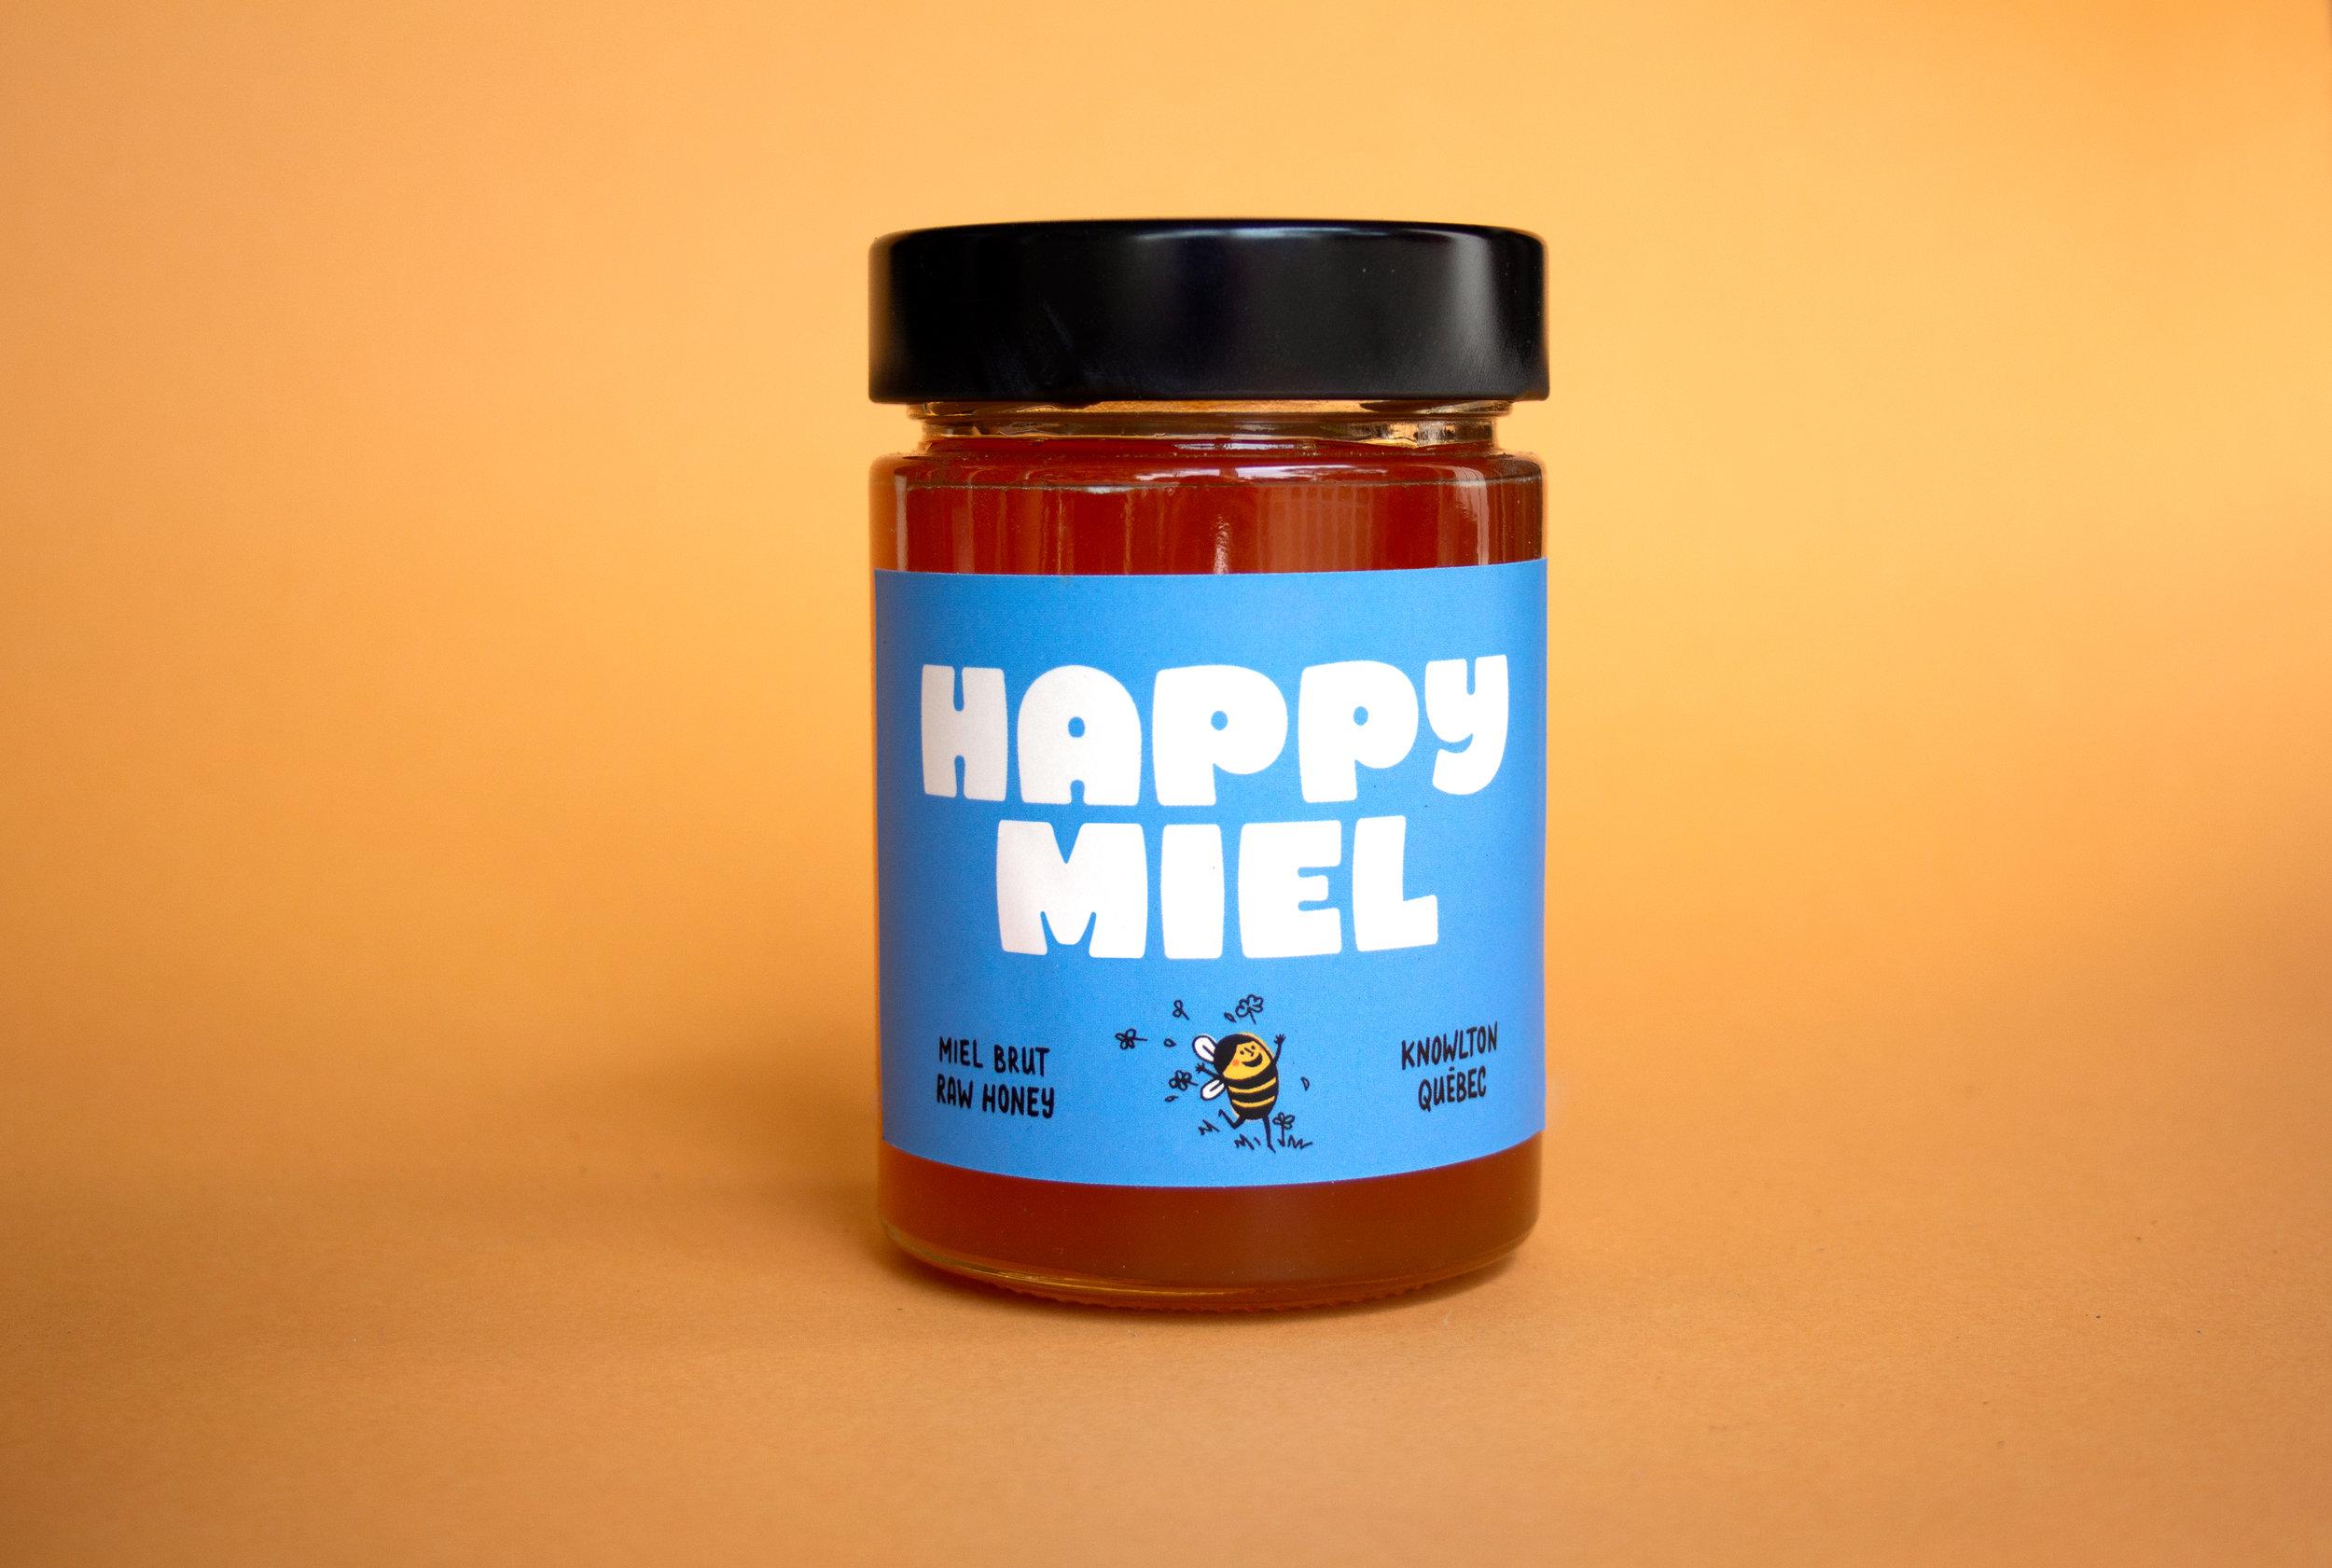 packaging_happy miel_stephanie aubin.jpg